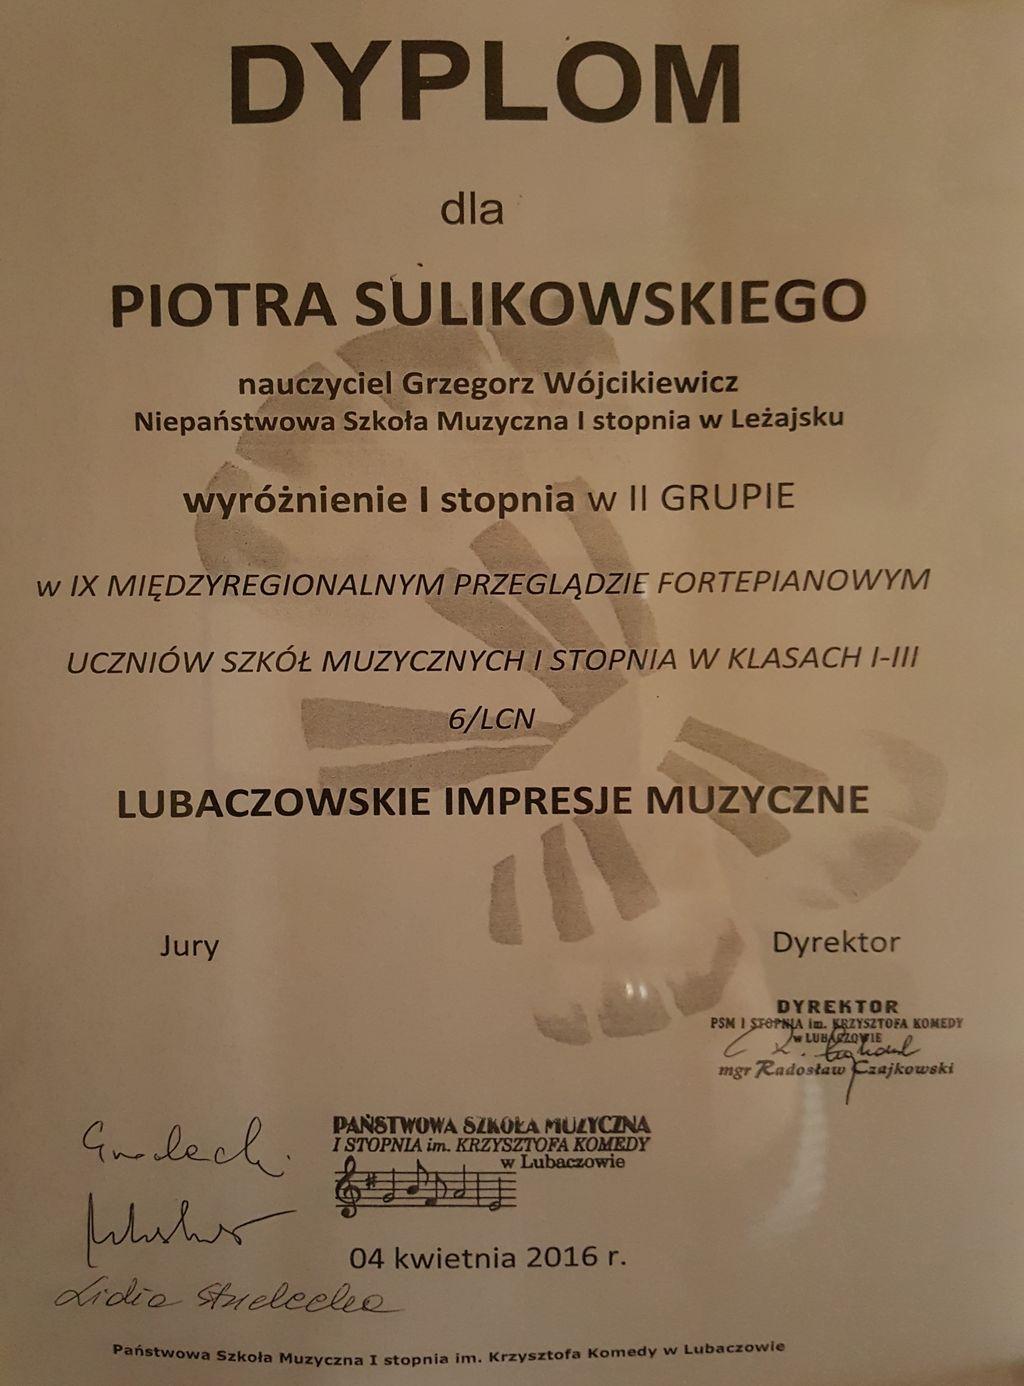 Piotr Sulikowski